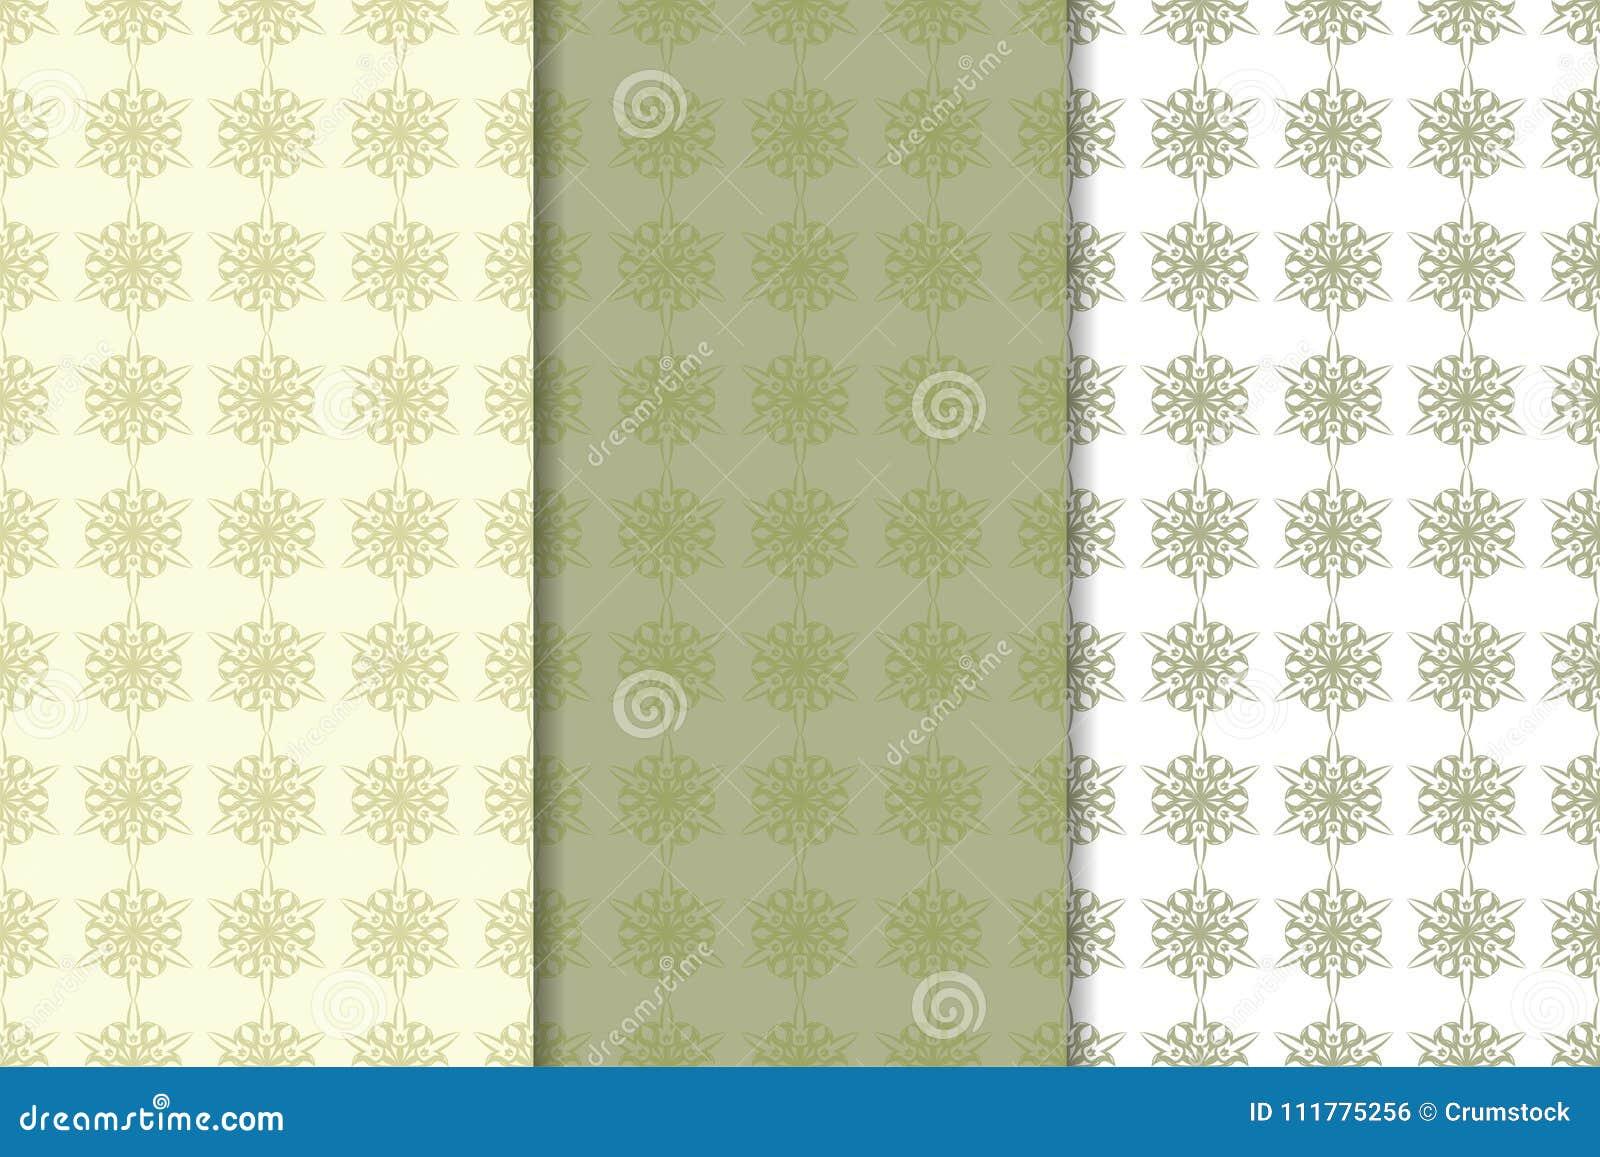 Olive green floral designs. Set of seamless patterns